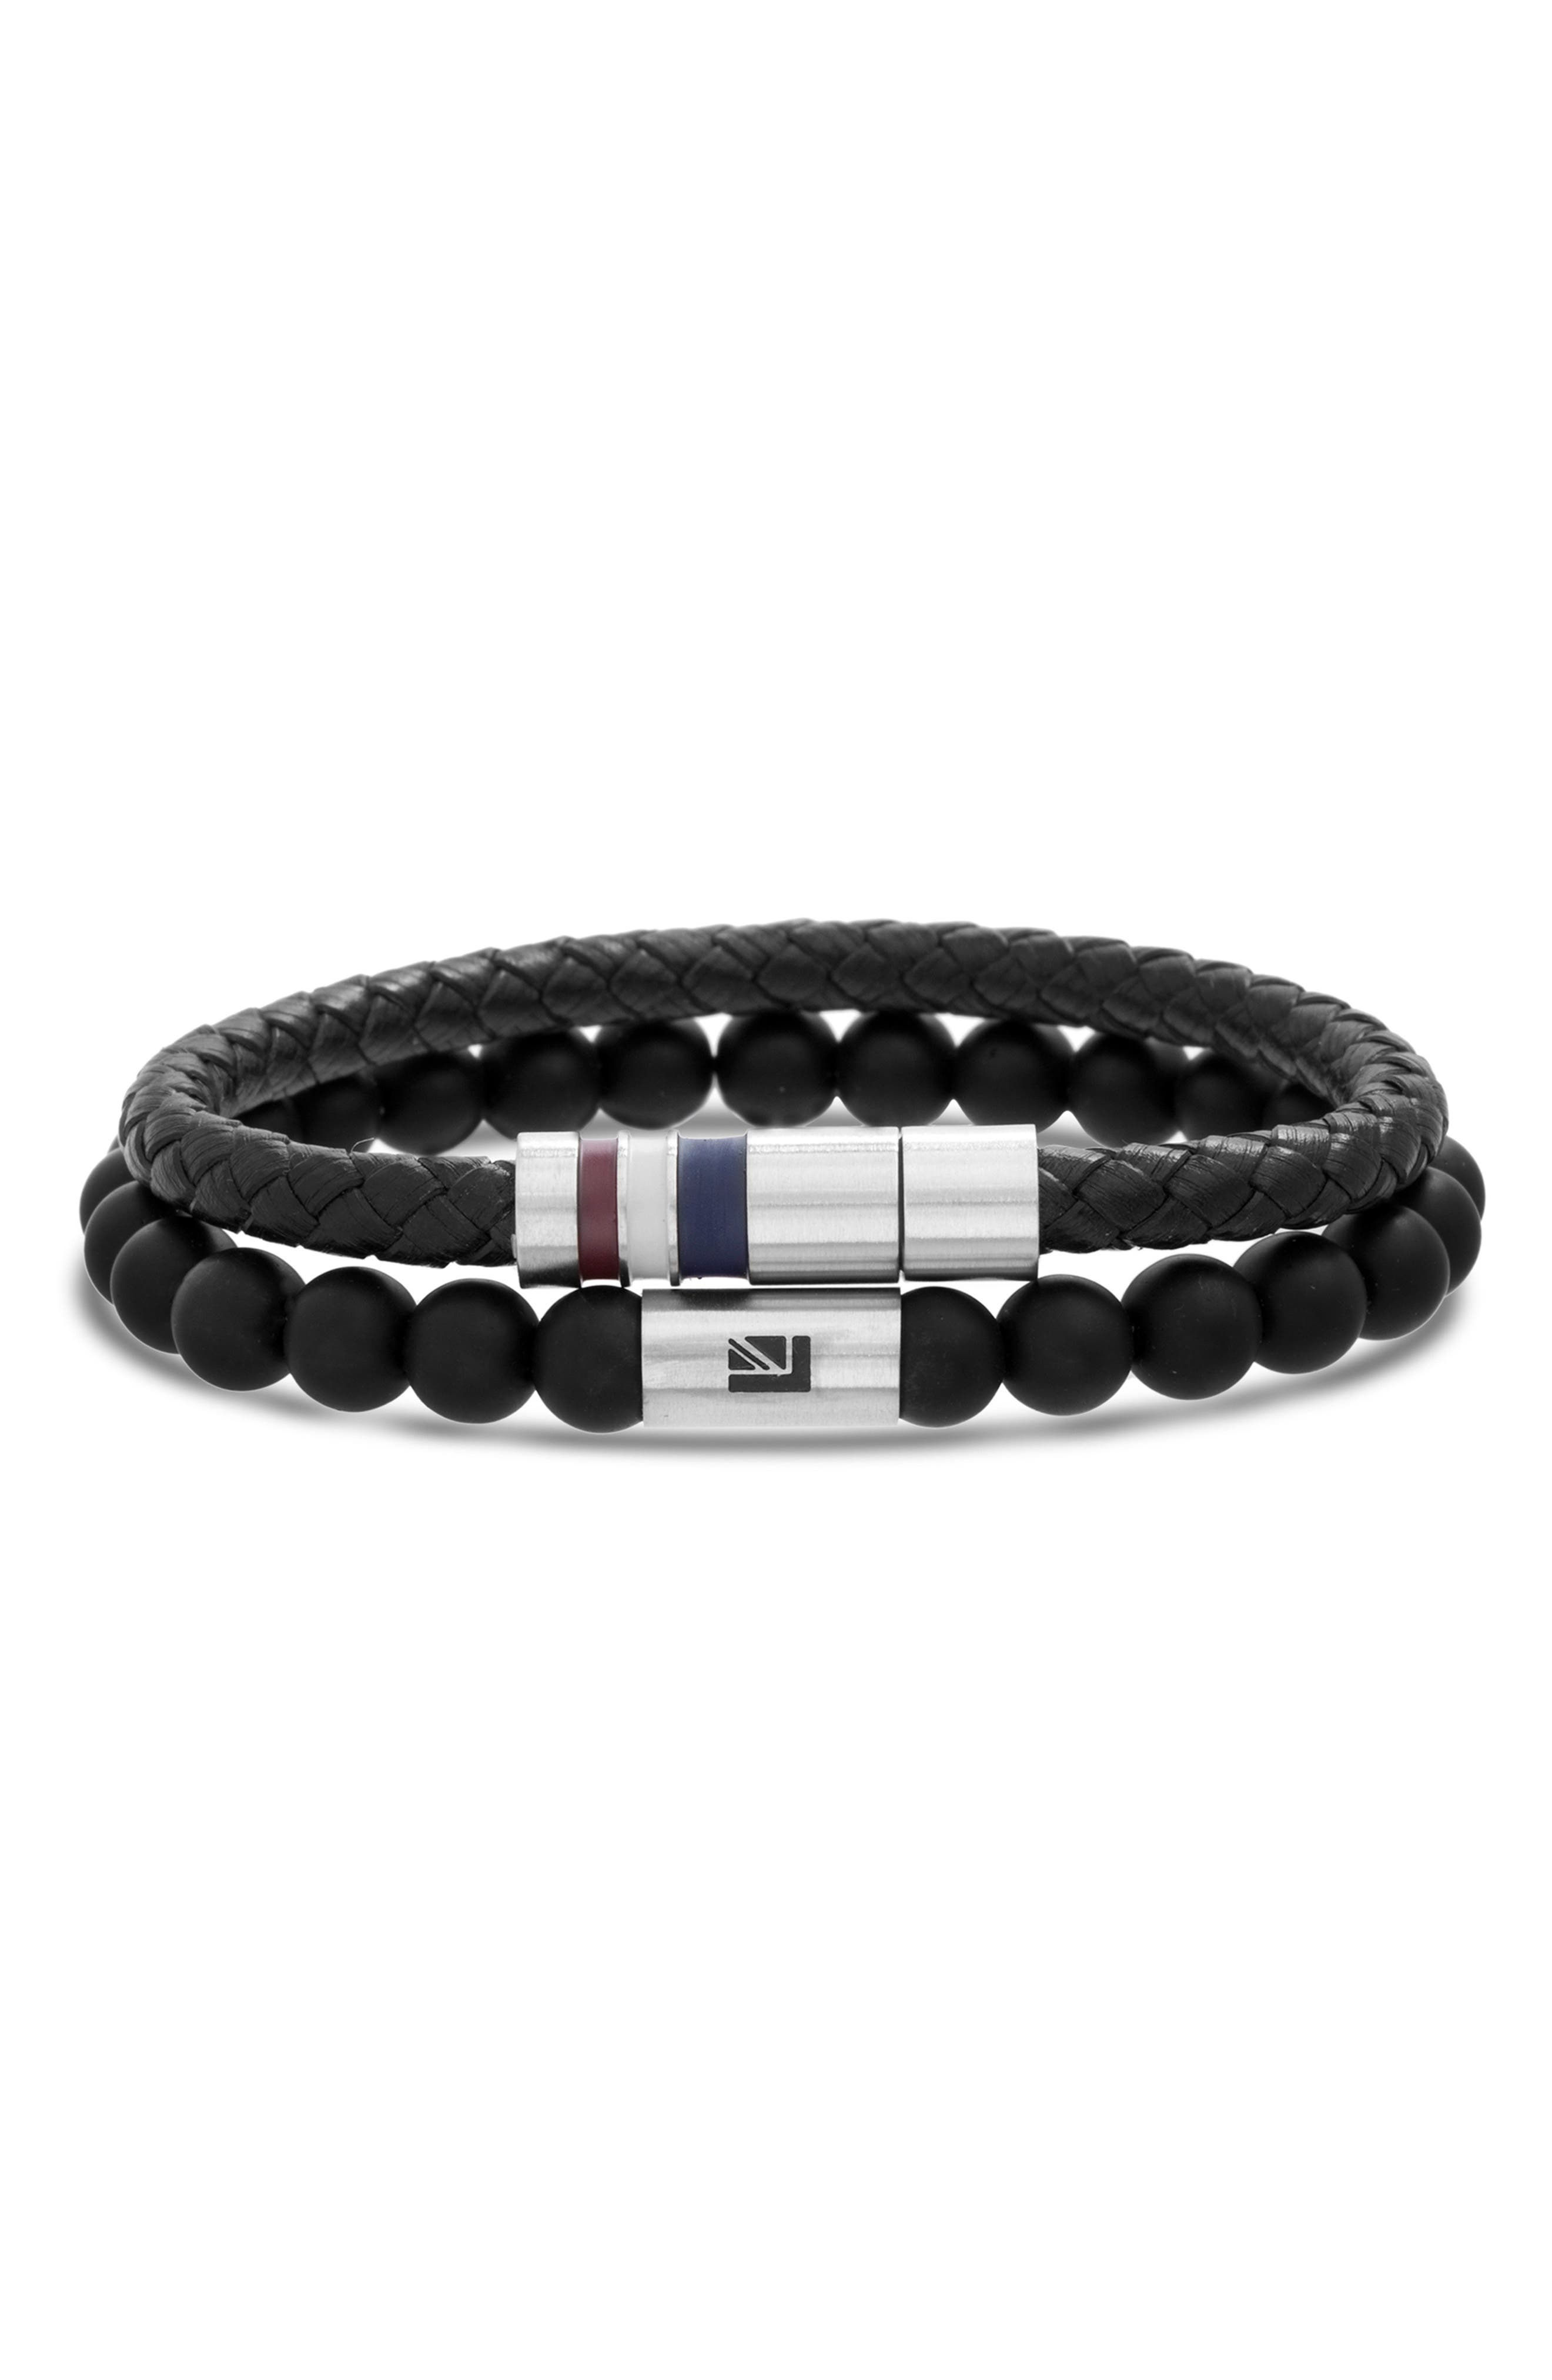 Leather & Bead Bracelet Set,                             Main thumbnail 1, color,                             BLACK